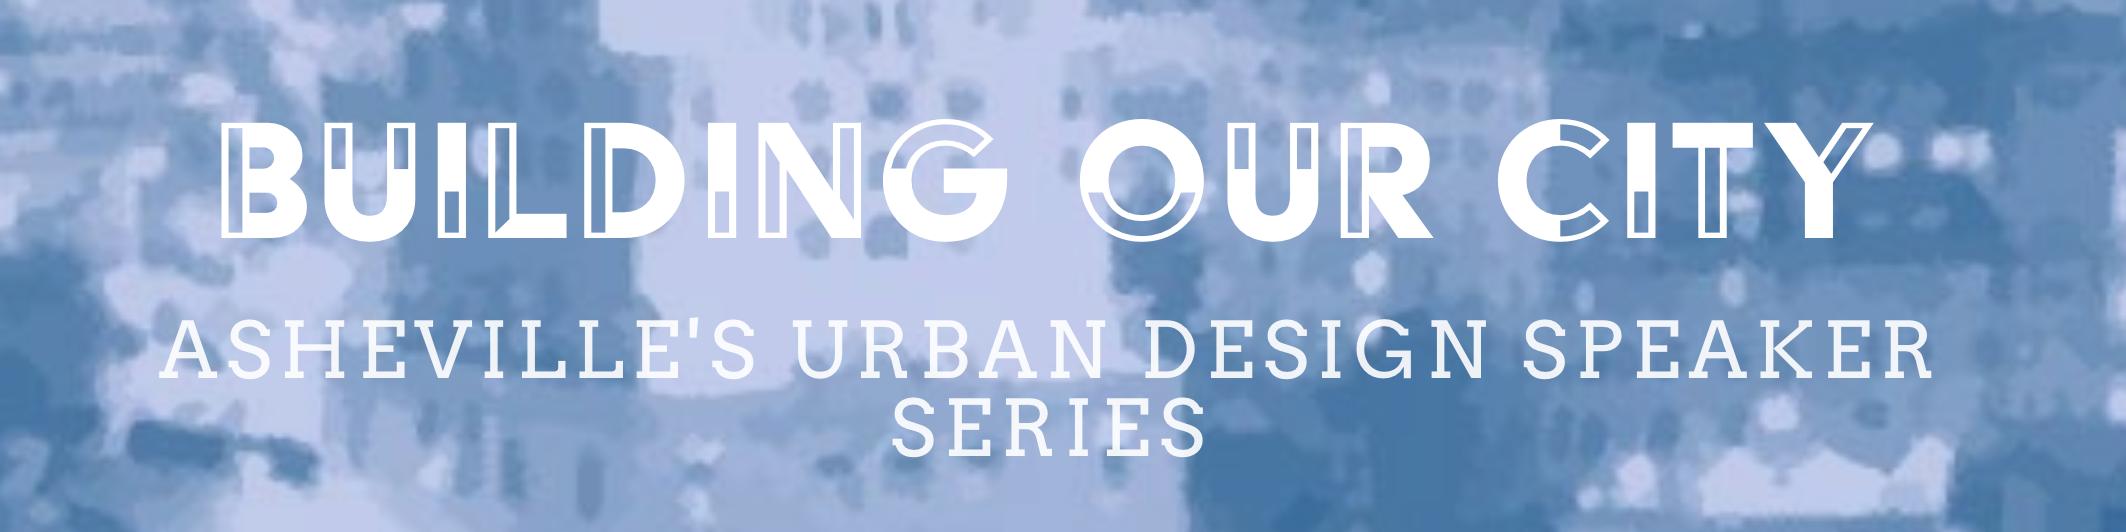 Building Our City Speaker Series Welcomes Dennis Pieprz